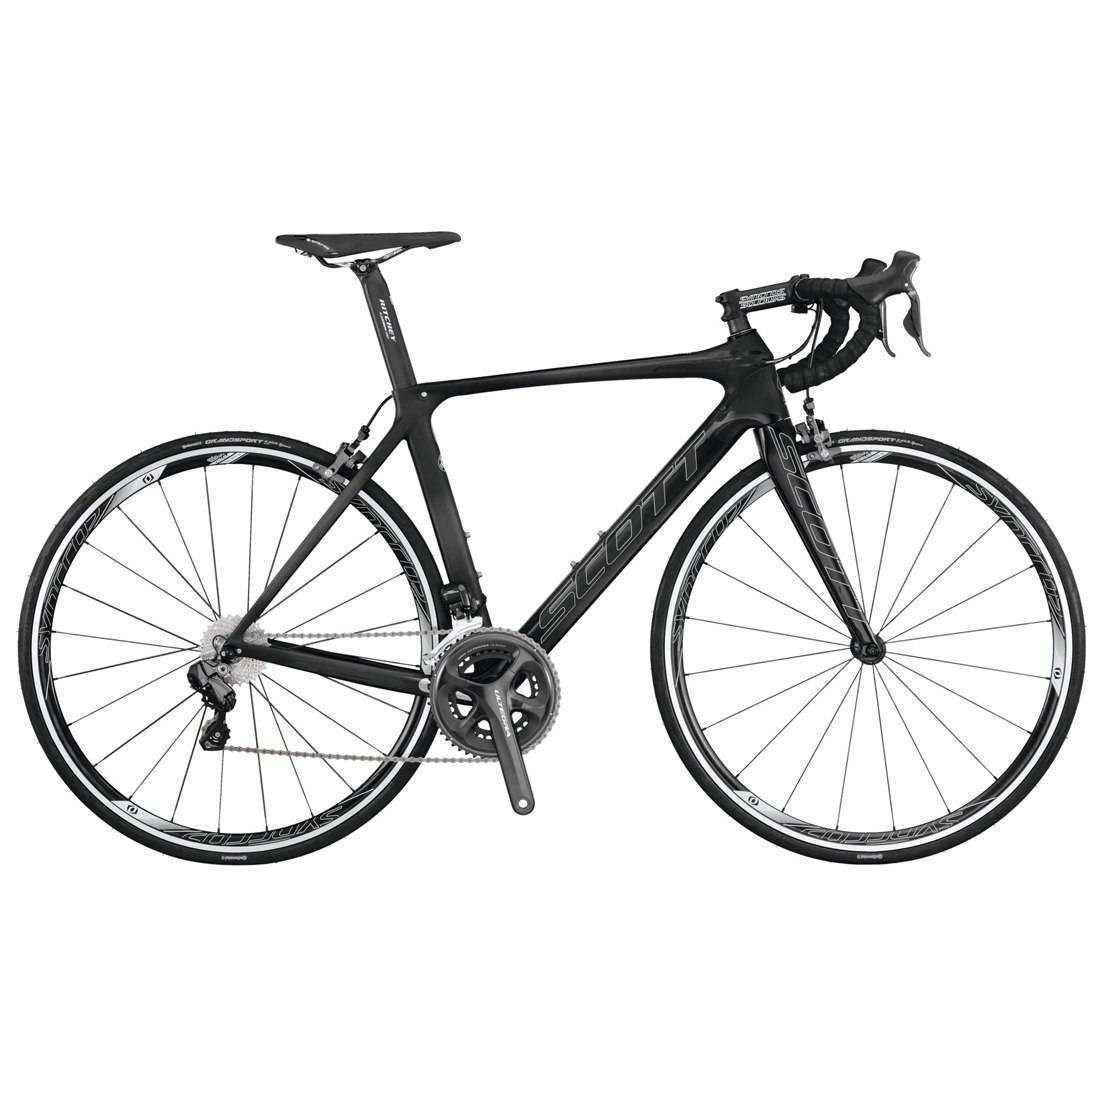 Scott Foil 15 Ultegra Di2 Carbon Road Bike Manufacturer Supplier Amp Exporter